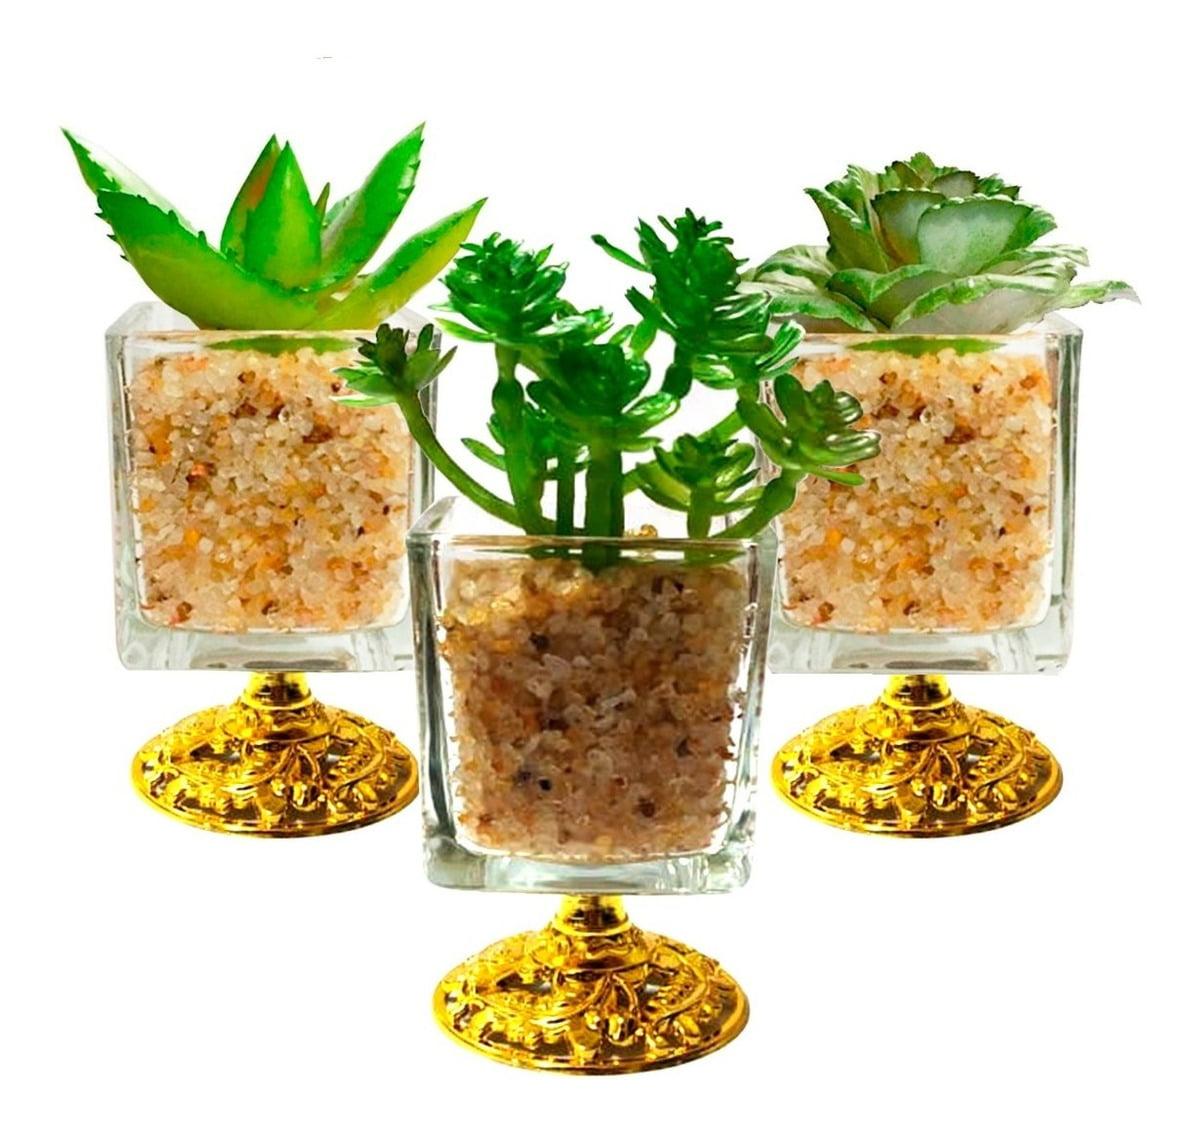 Kit 4 Vaso Decorativo Com Planta Suculenta Artificial